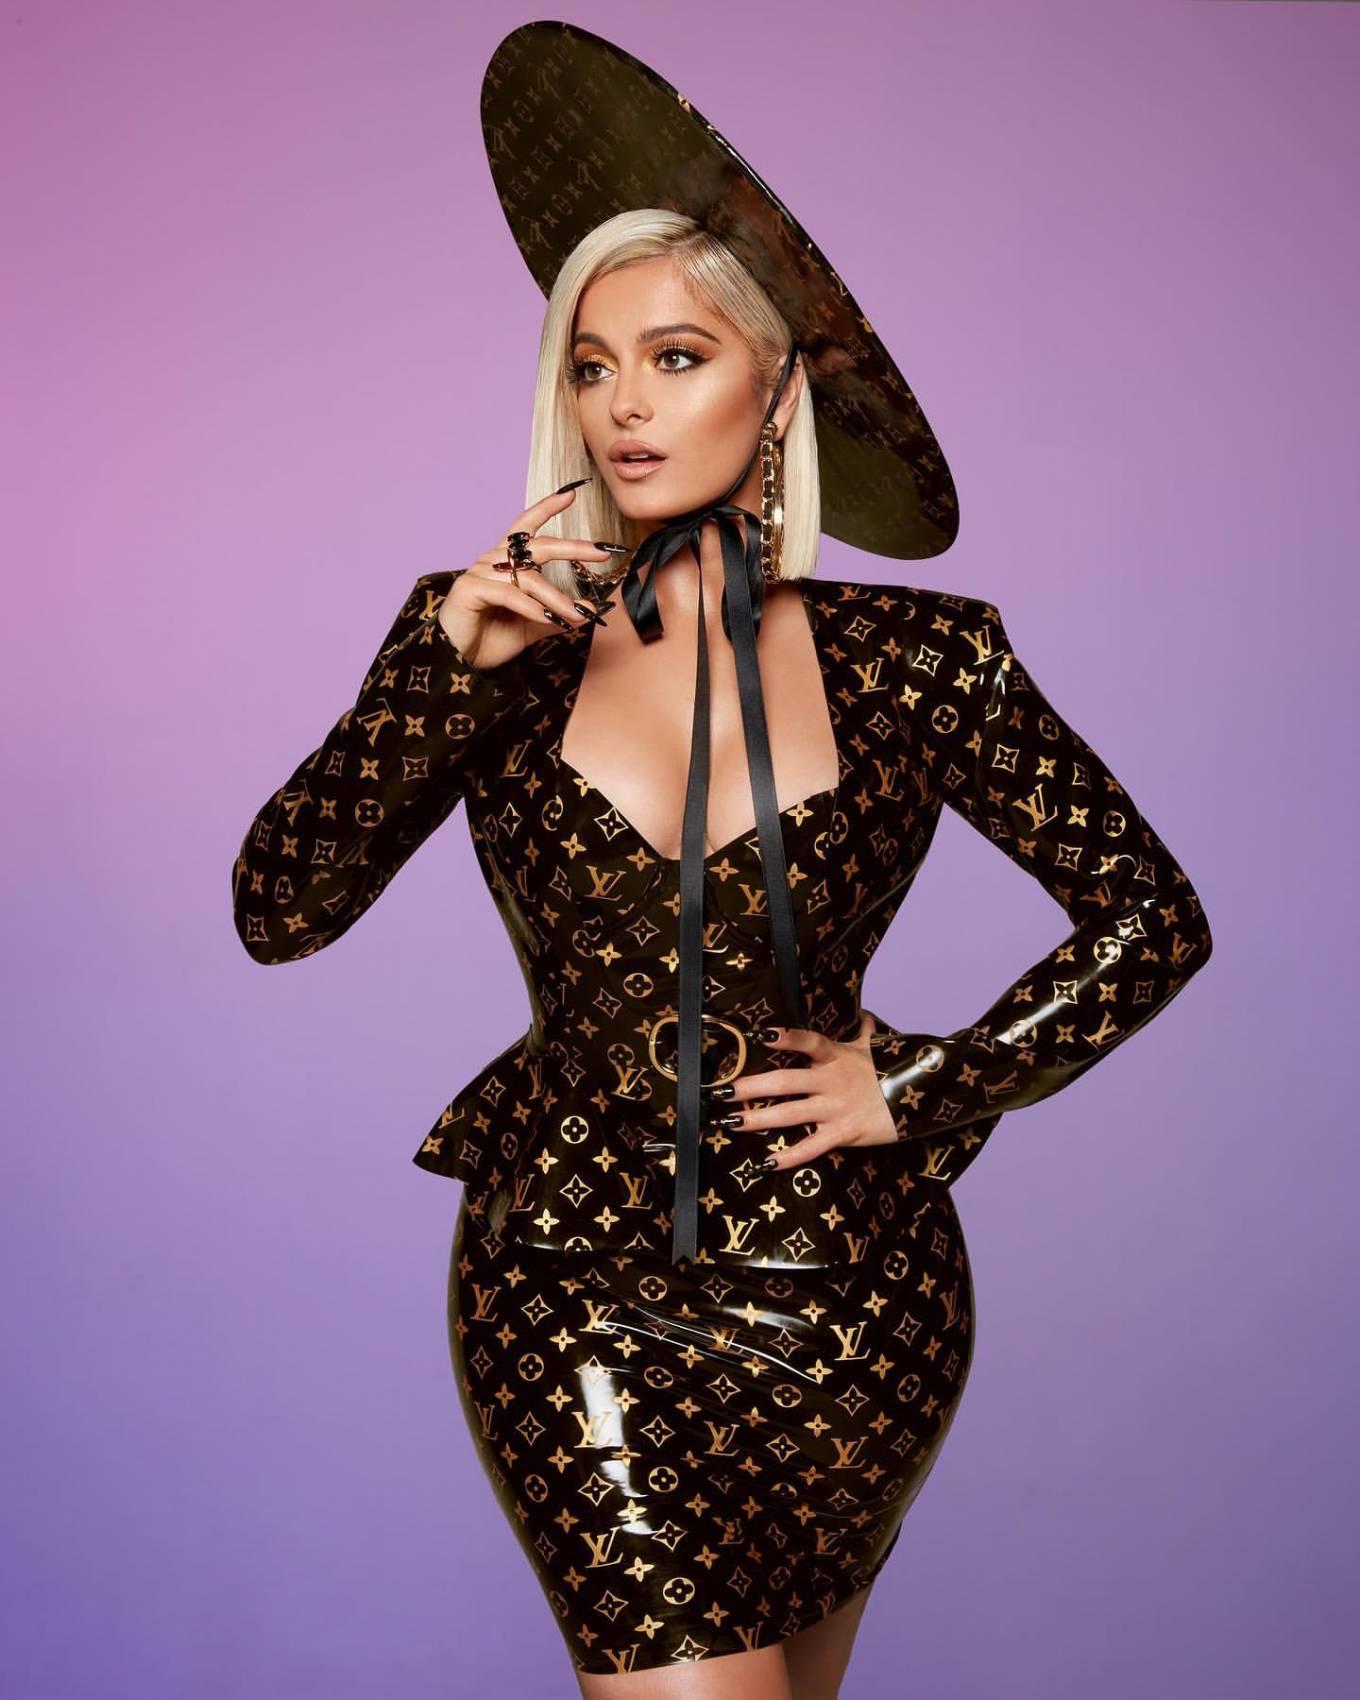 Bebe Rexha - Photoshoot by Albert Sanchez (July 2020)